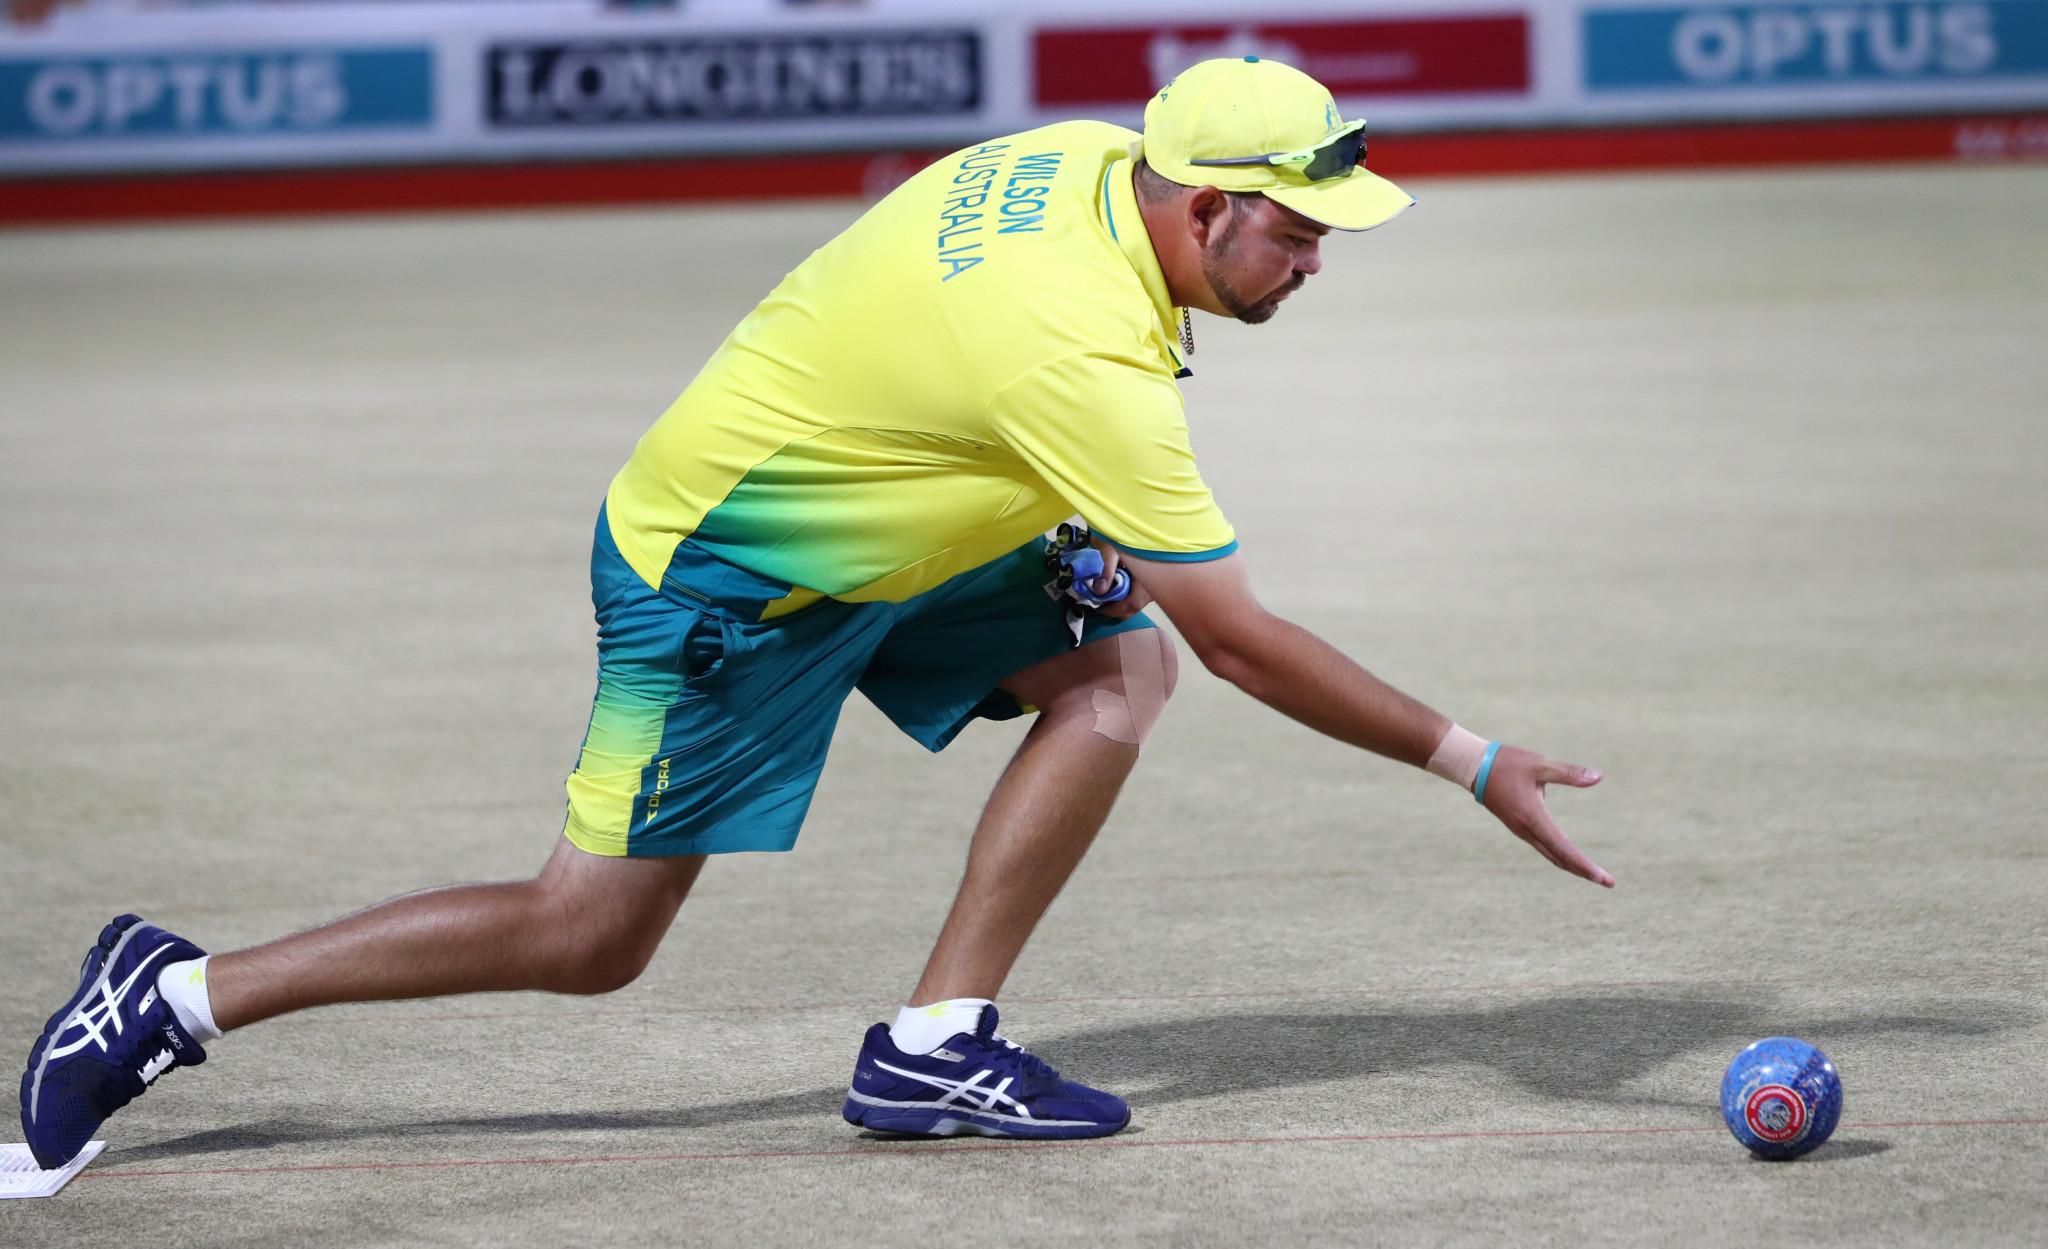 Bowls Australia announces new partnership with Audika